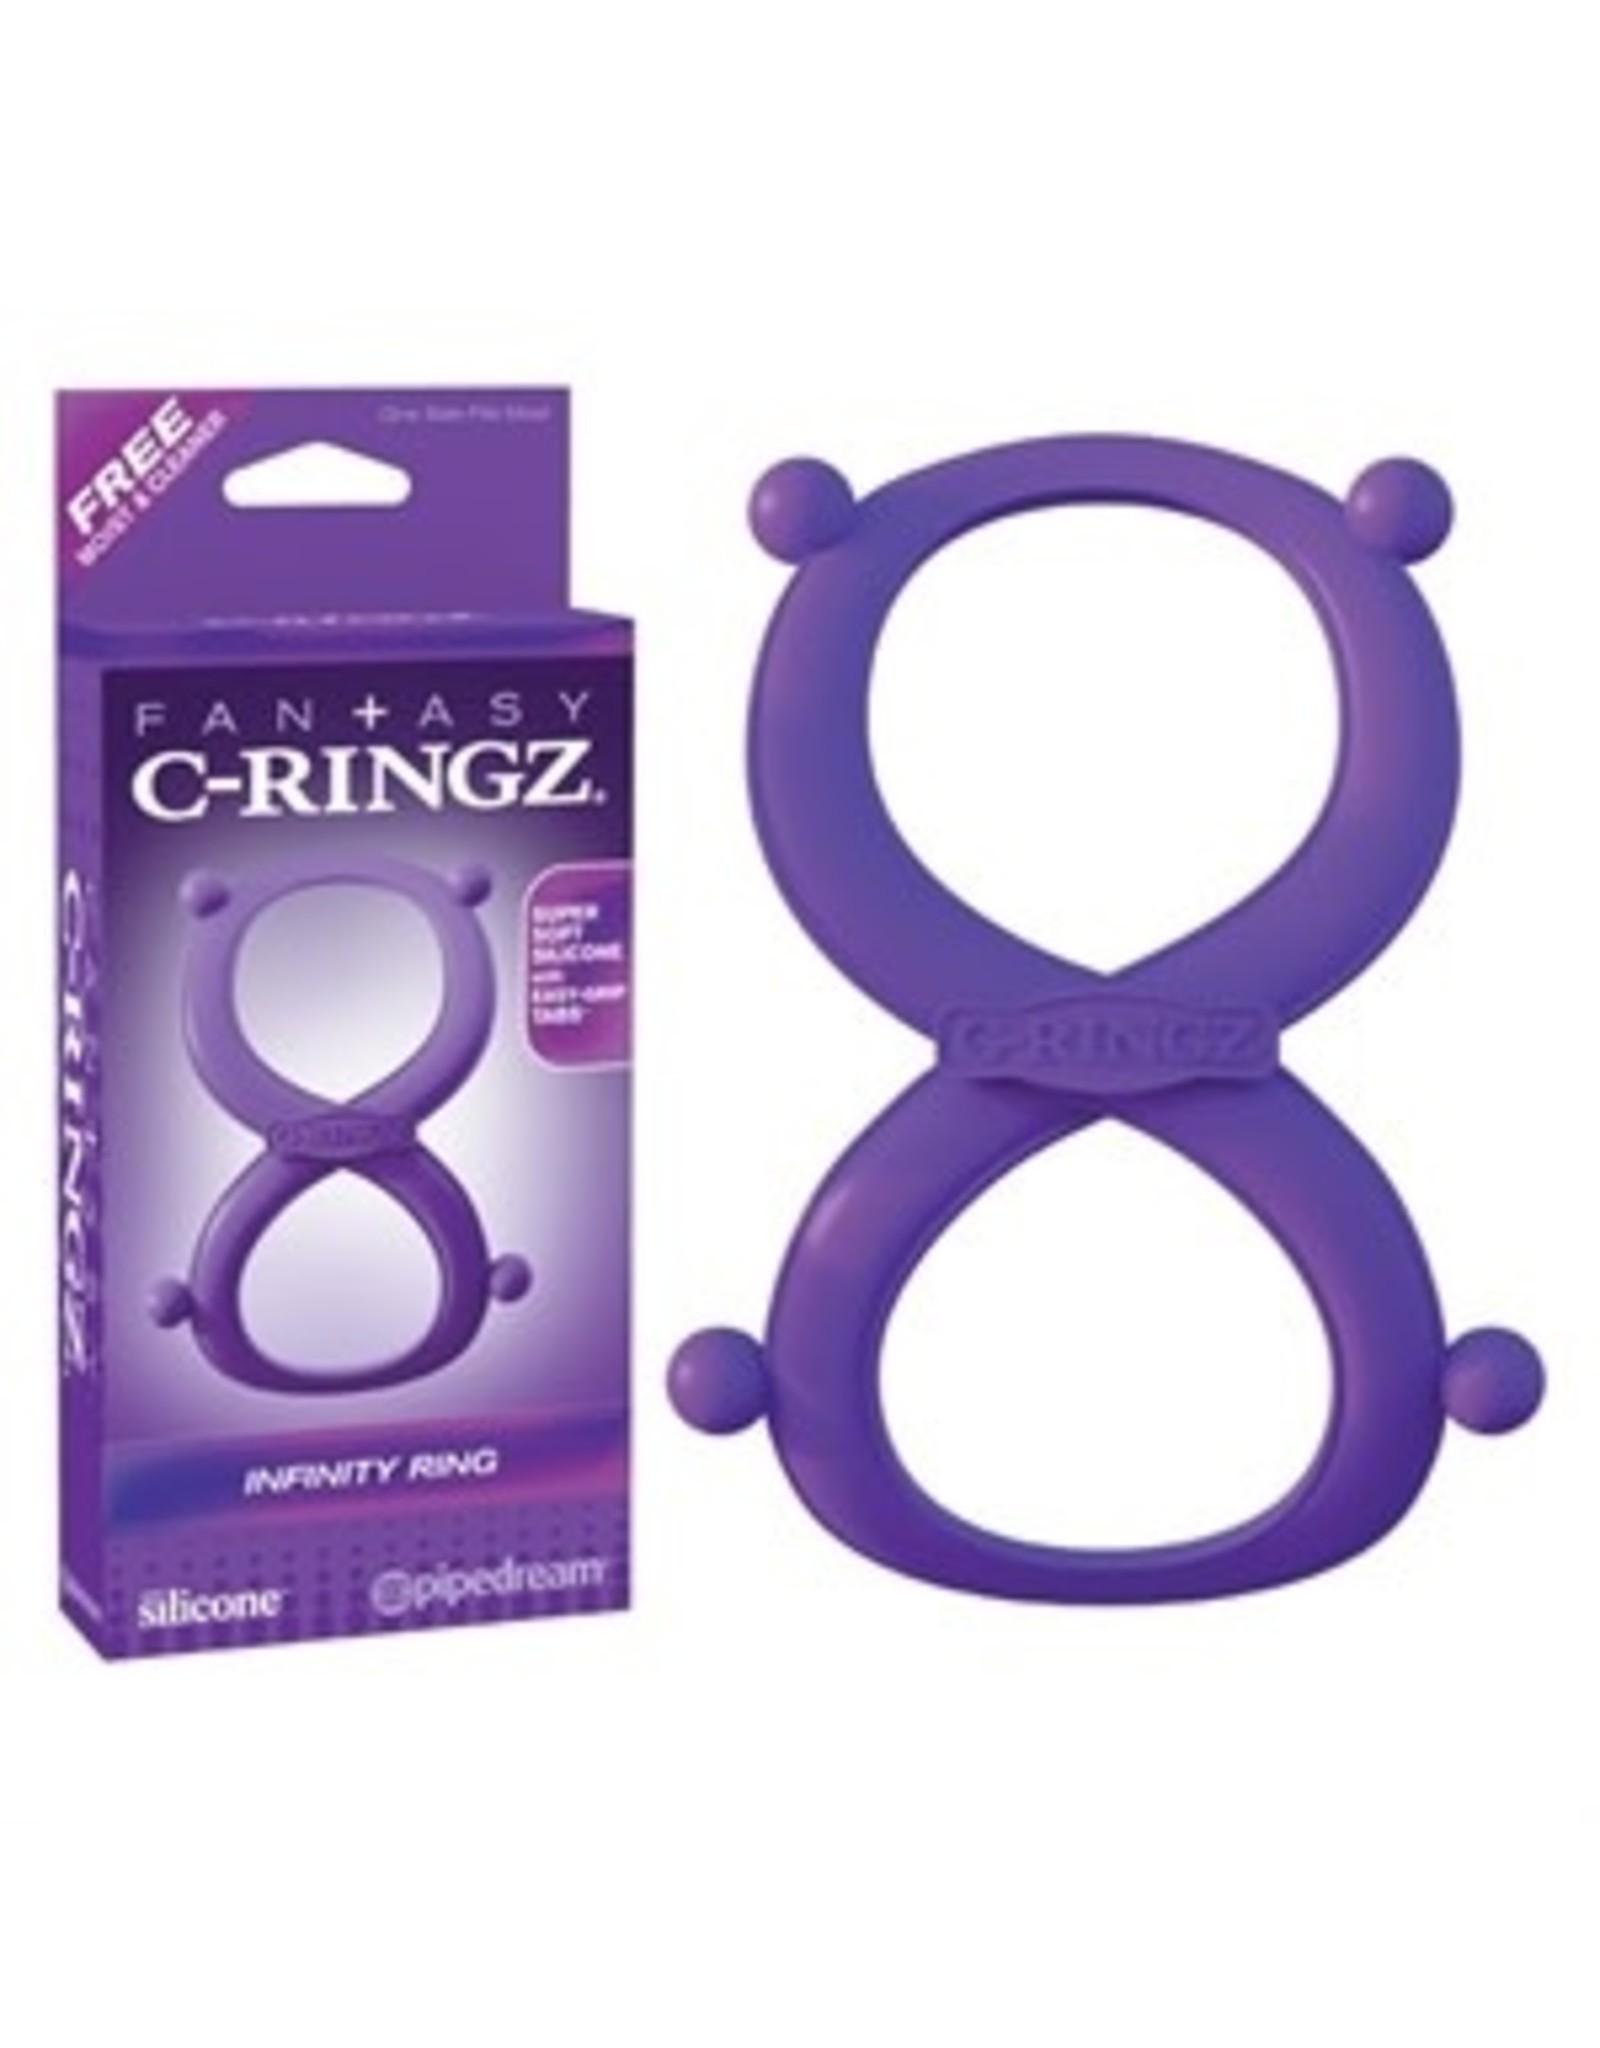 Pipedream Fantasy C-Ringz - Silicone Infinity Ring - Purple